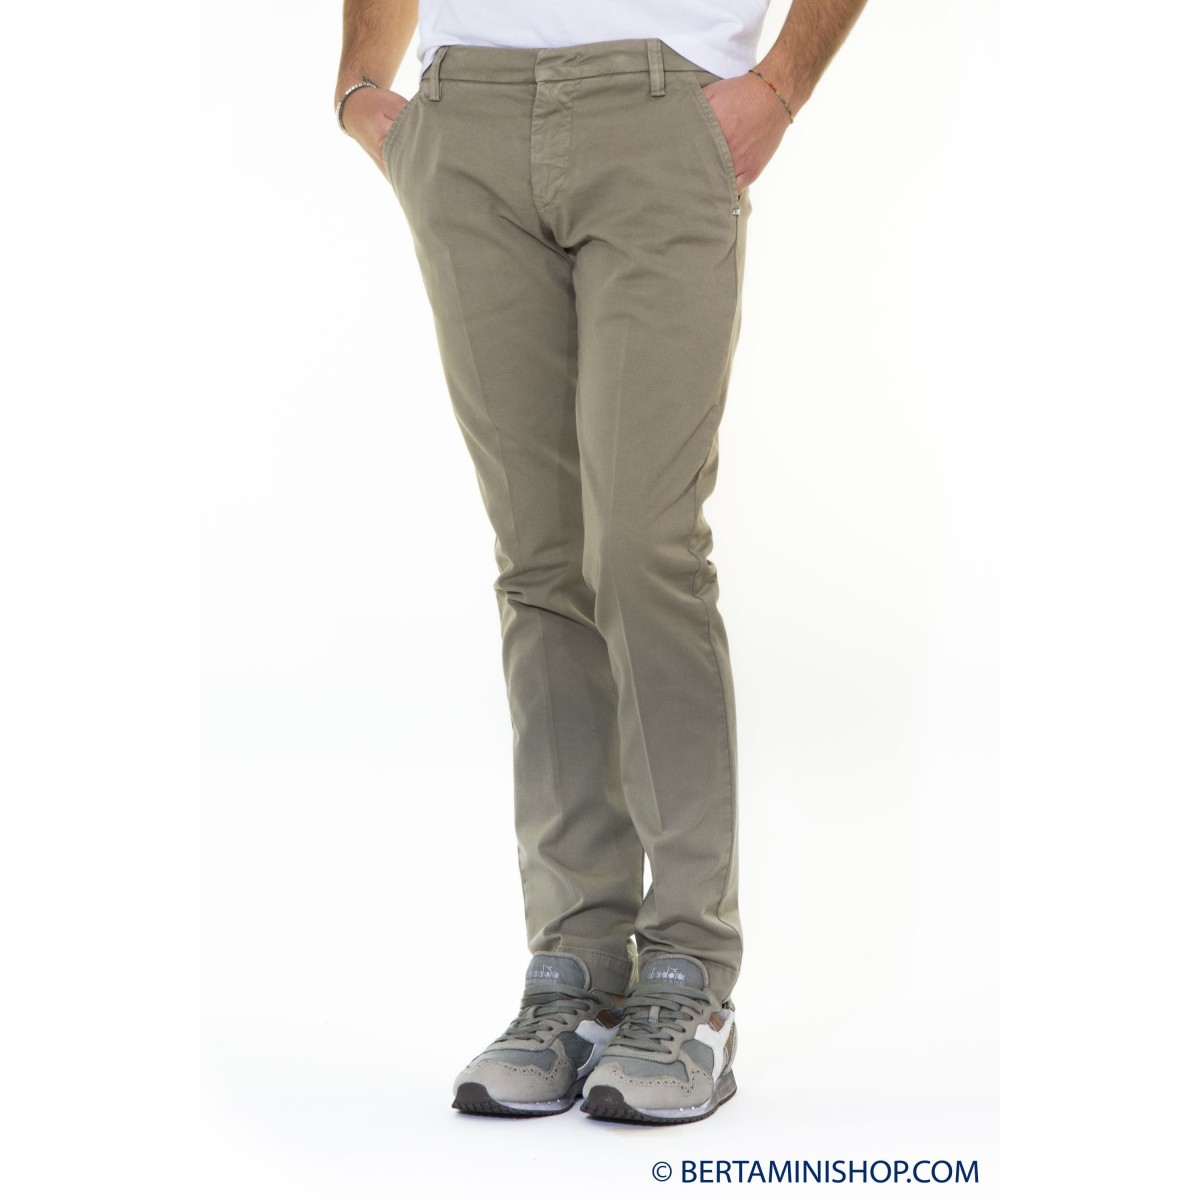 Hosen Entre Amis Manner - 8201/292L17  Strech 505 - Nocciola